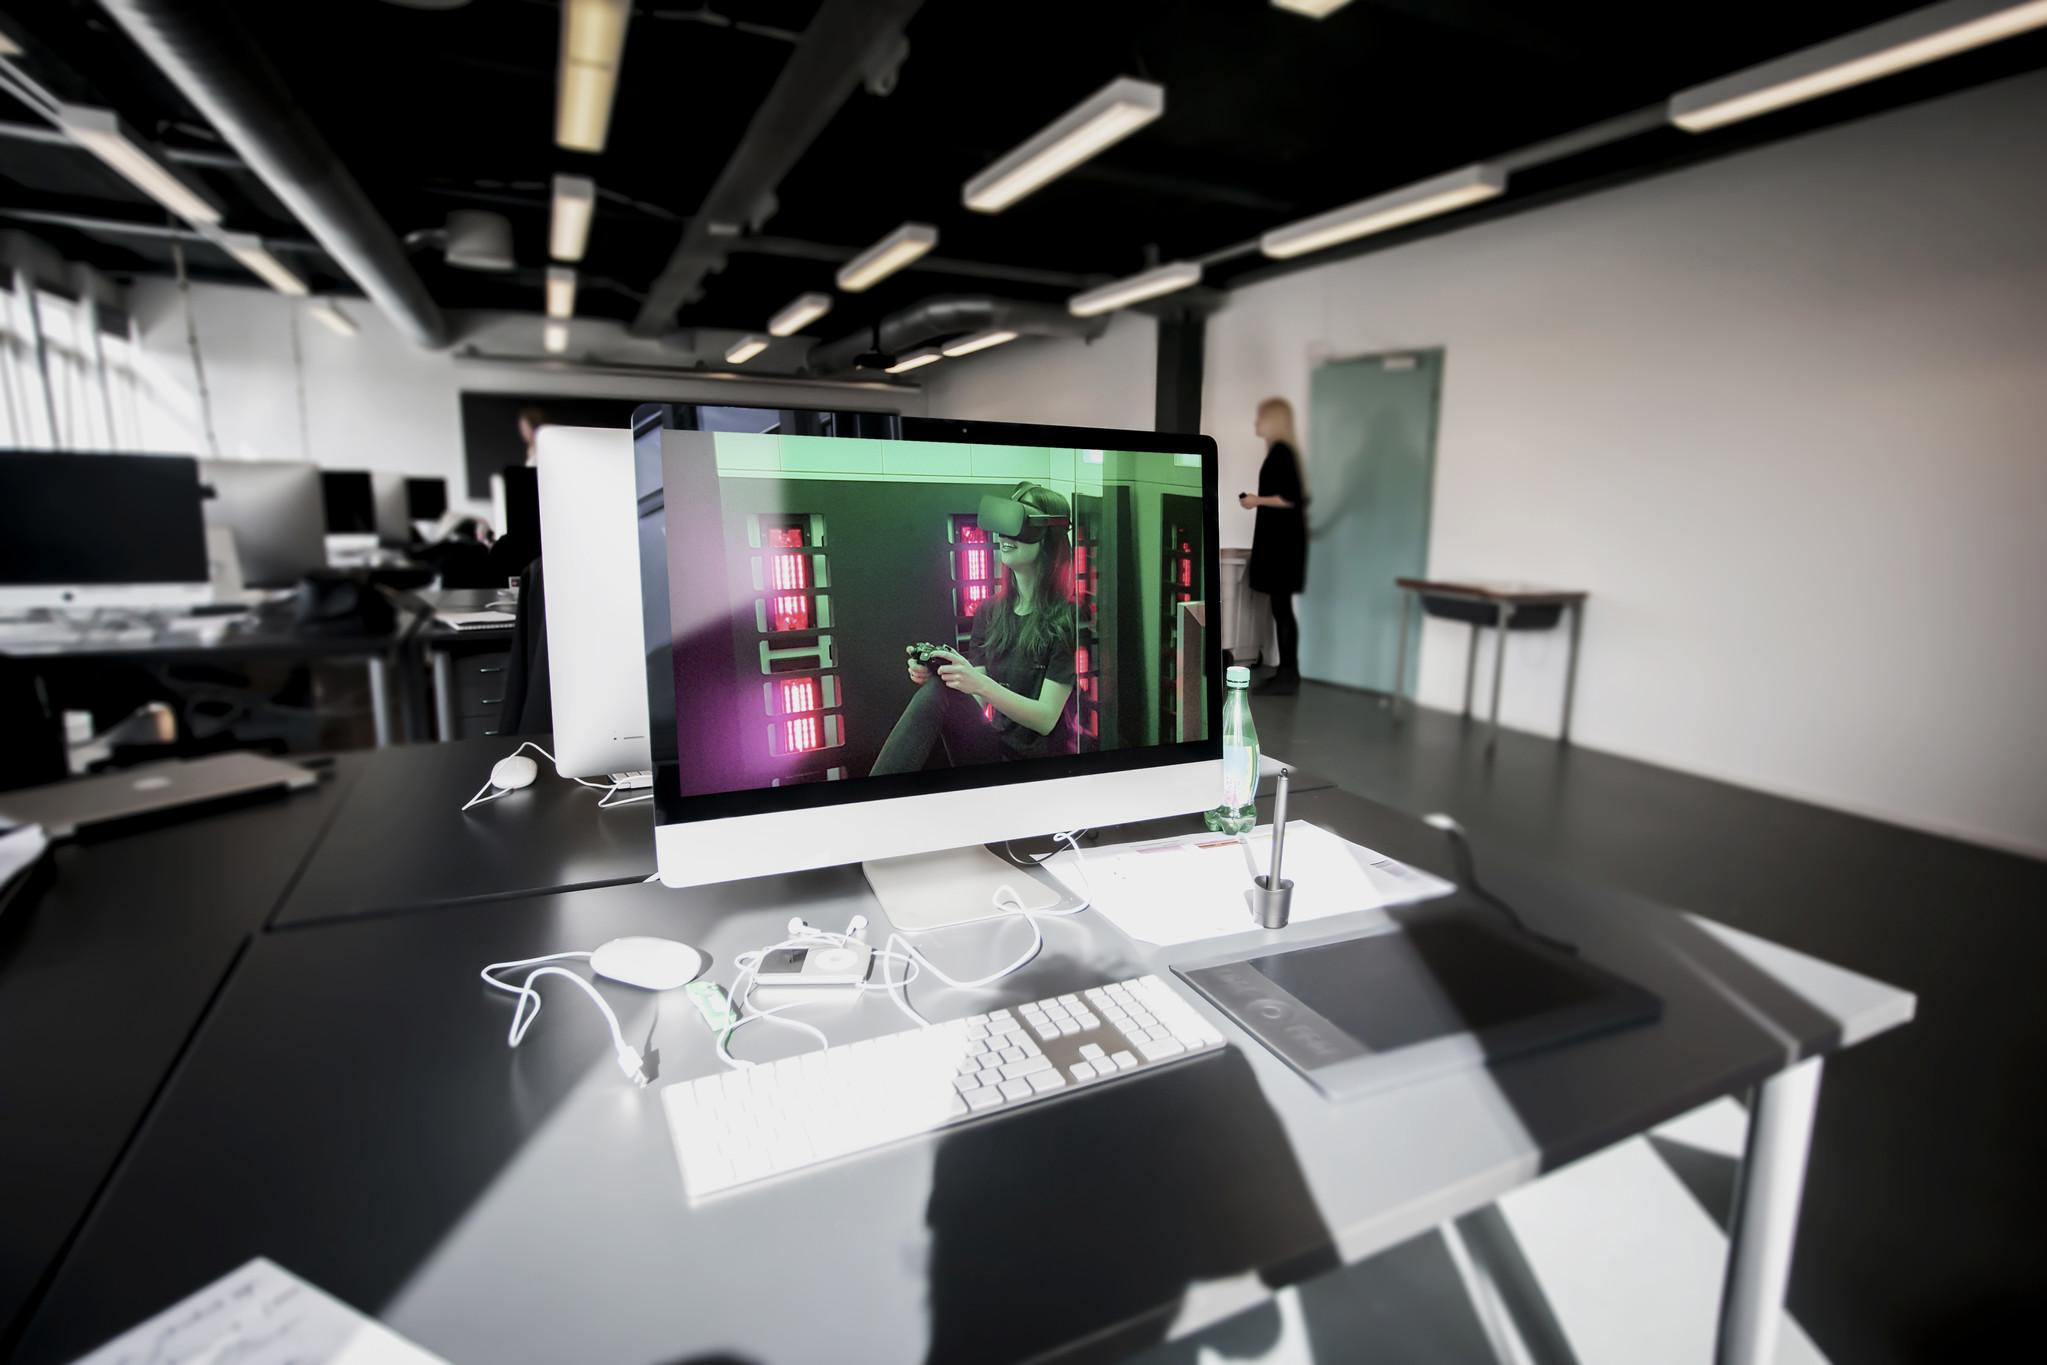 employee wellbeing office spaces multi sensory virtual reality sensiks